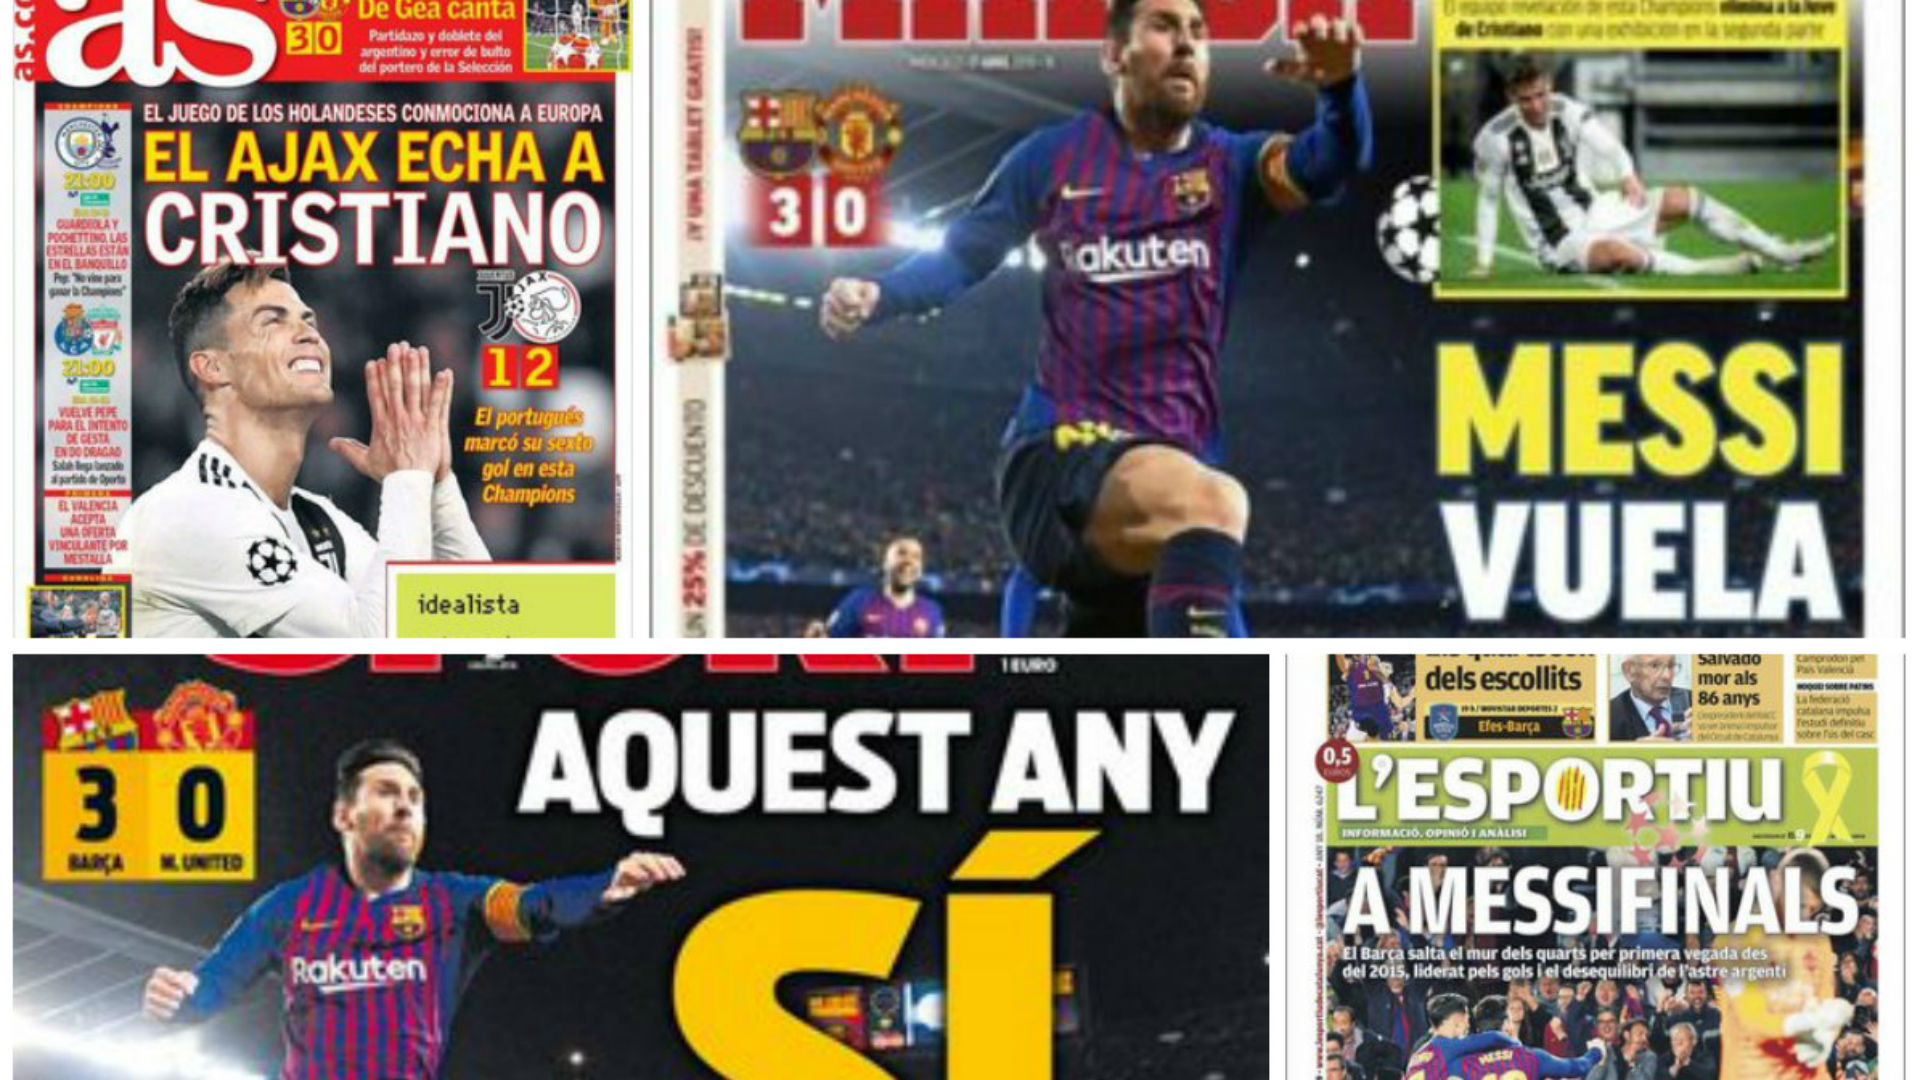 Prensa Messi 17042019